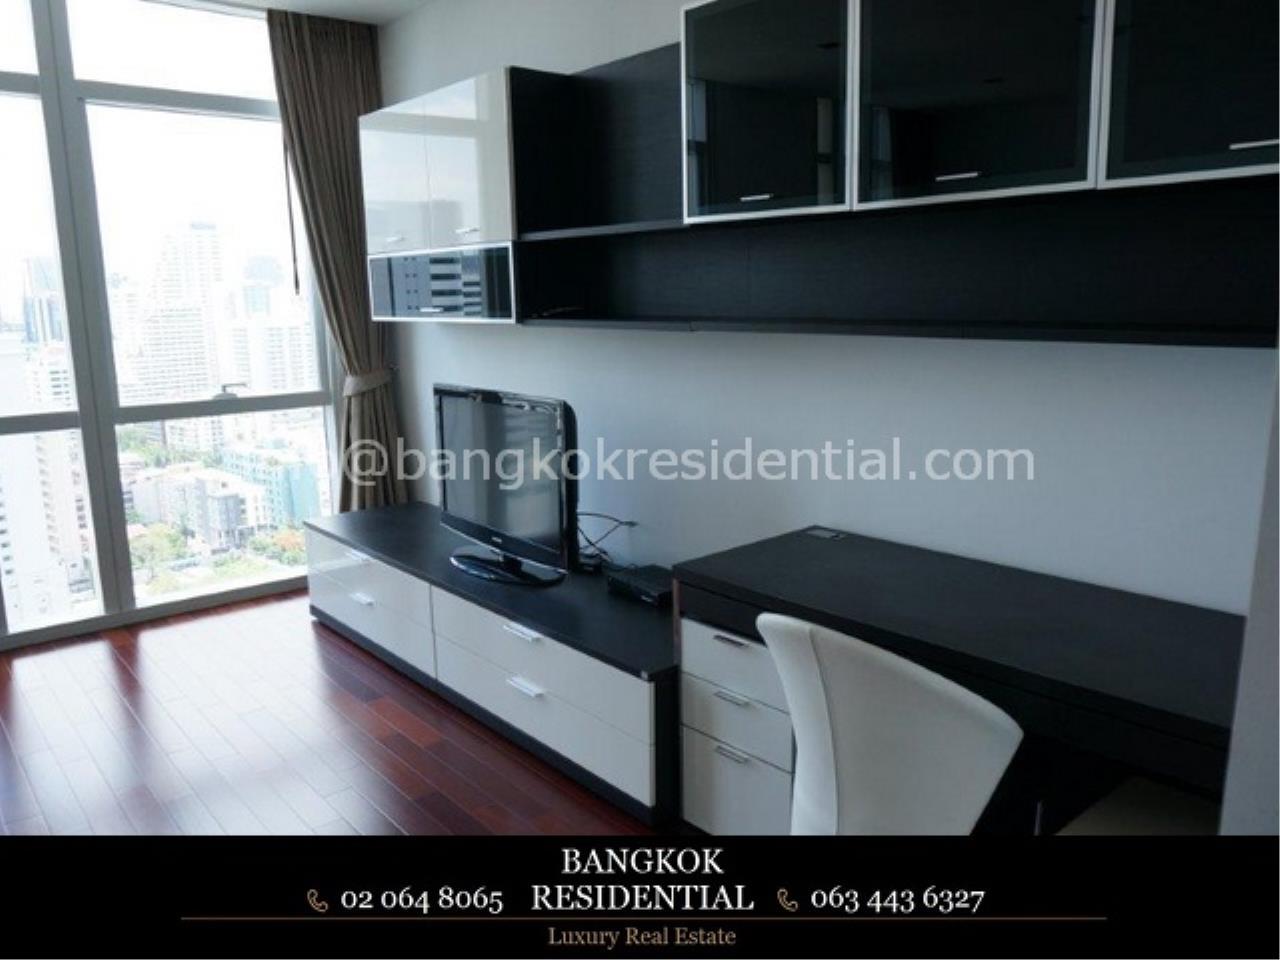 Bangkok Residential Agency's 3BR Athenee Residence For Sale Or Rent (BR3386CD) 9